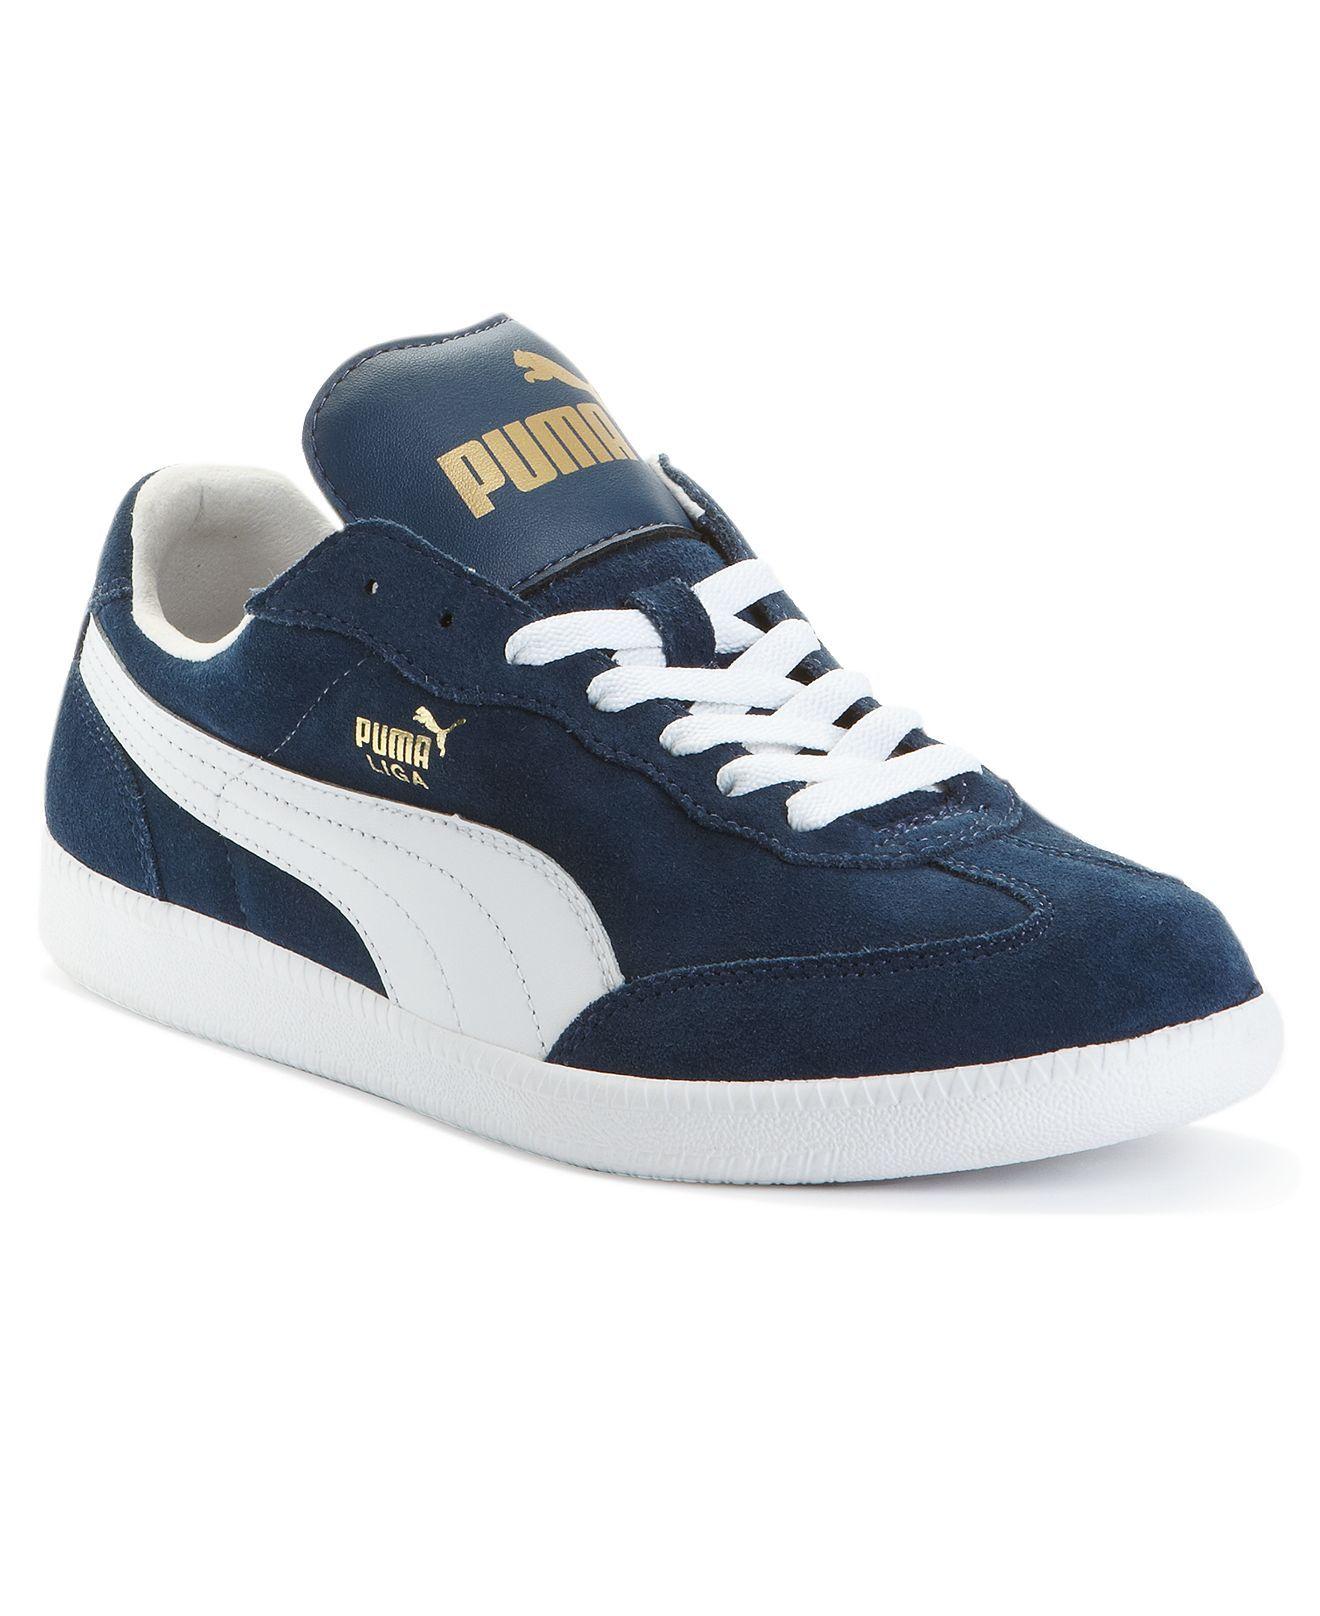 chaussure puma liga homme